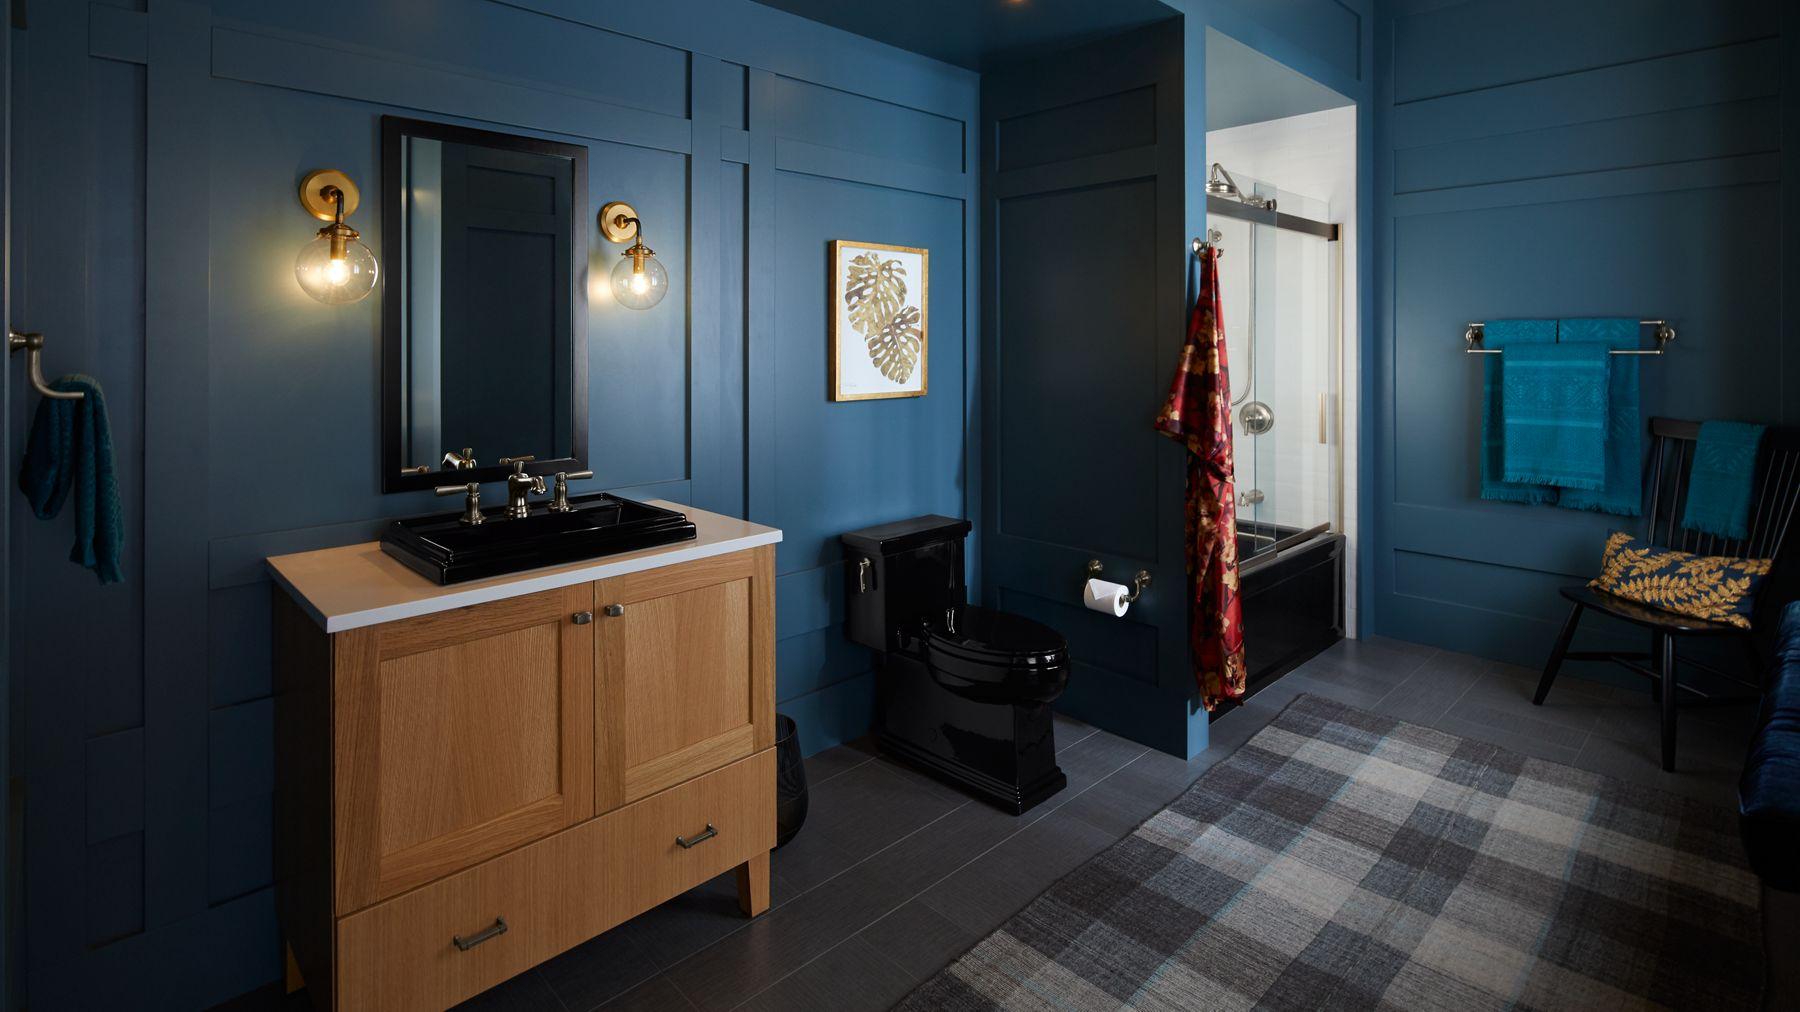 floor and decor mesquite houses flooring picture ideas.htm mezzanine level designer galleries  mezzanine level designer galleries